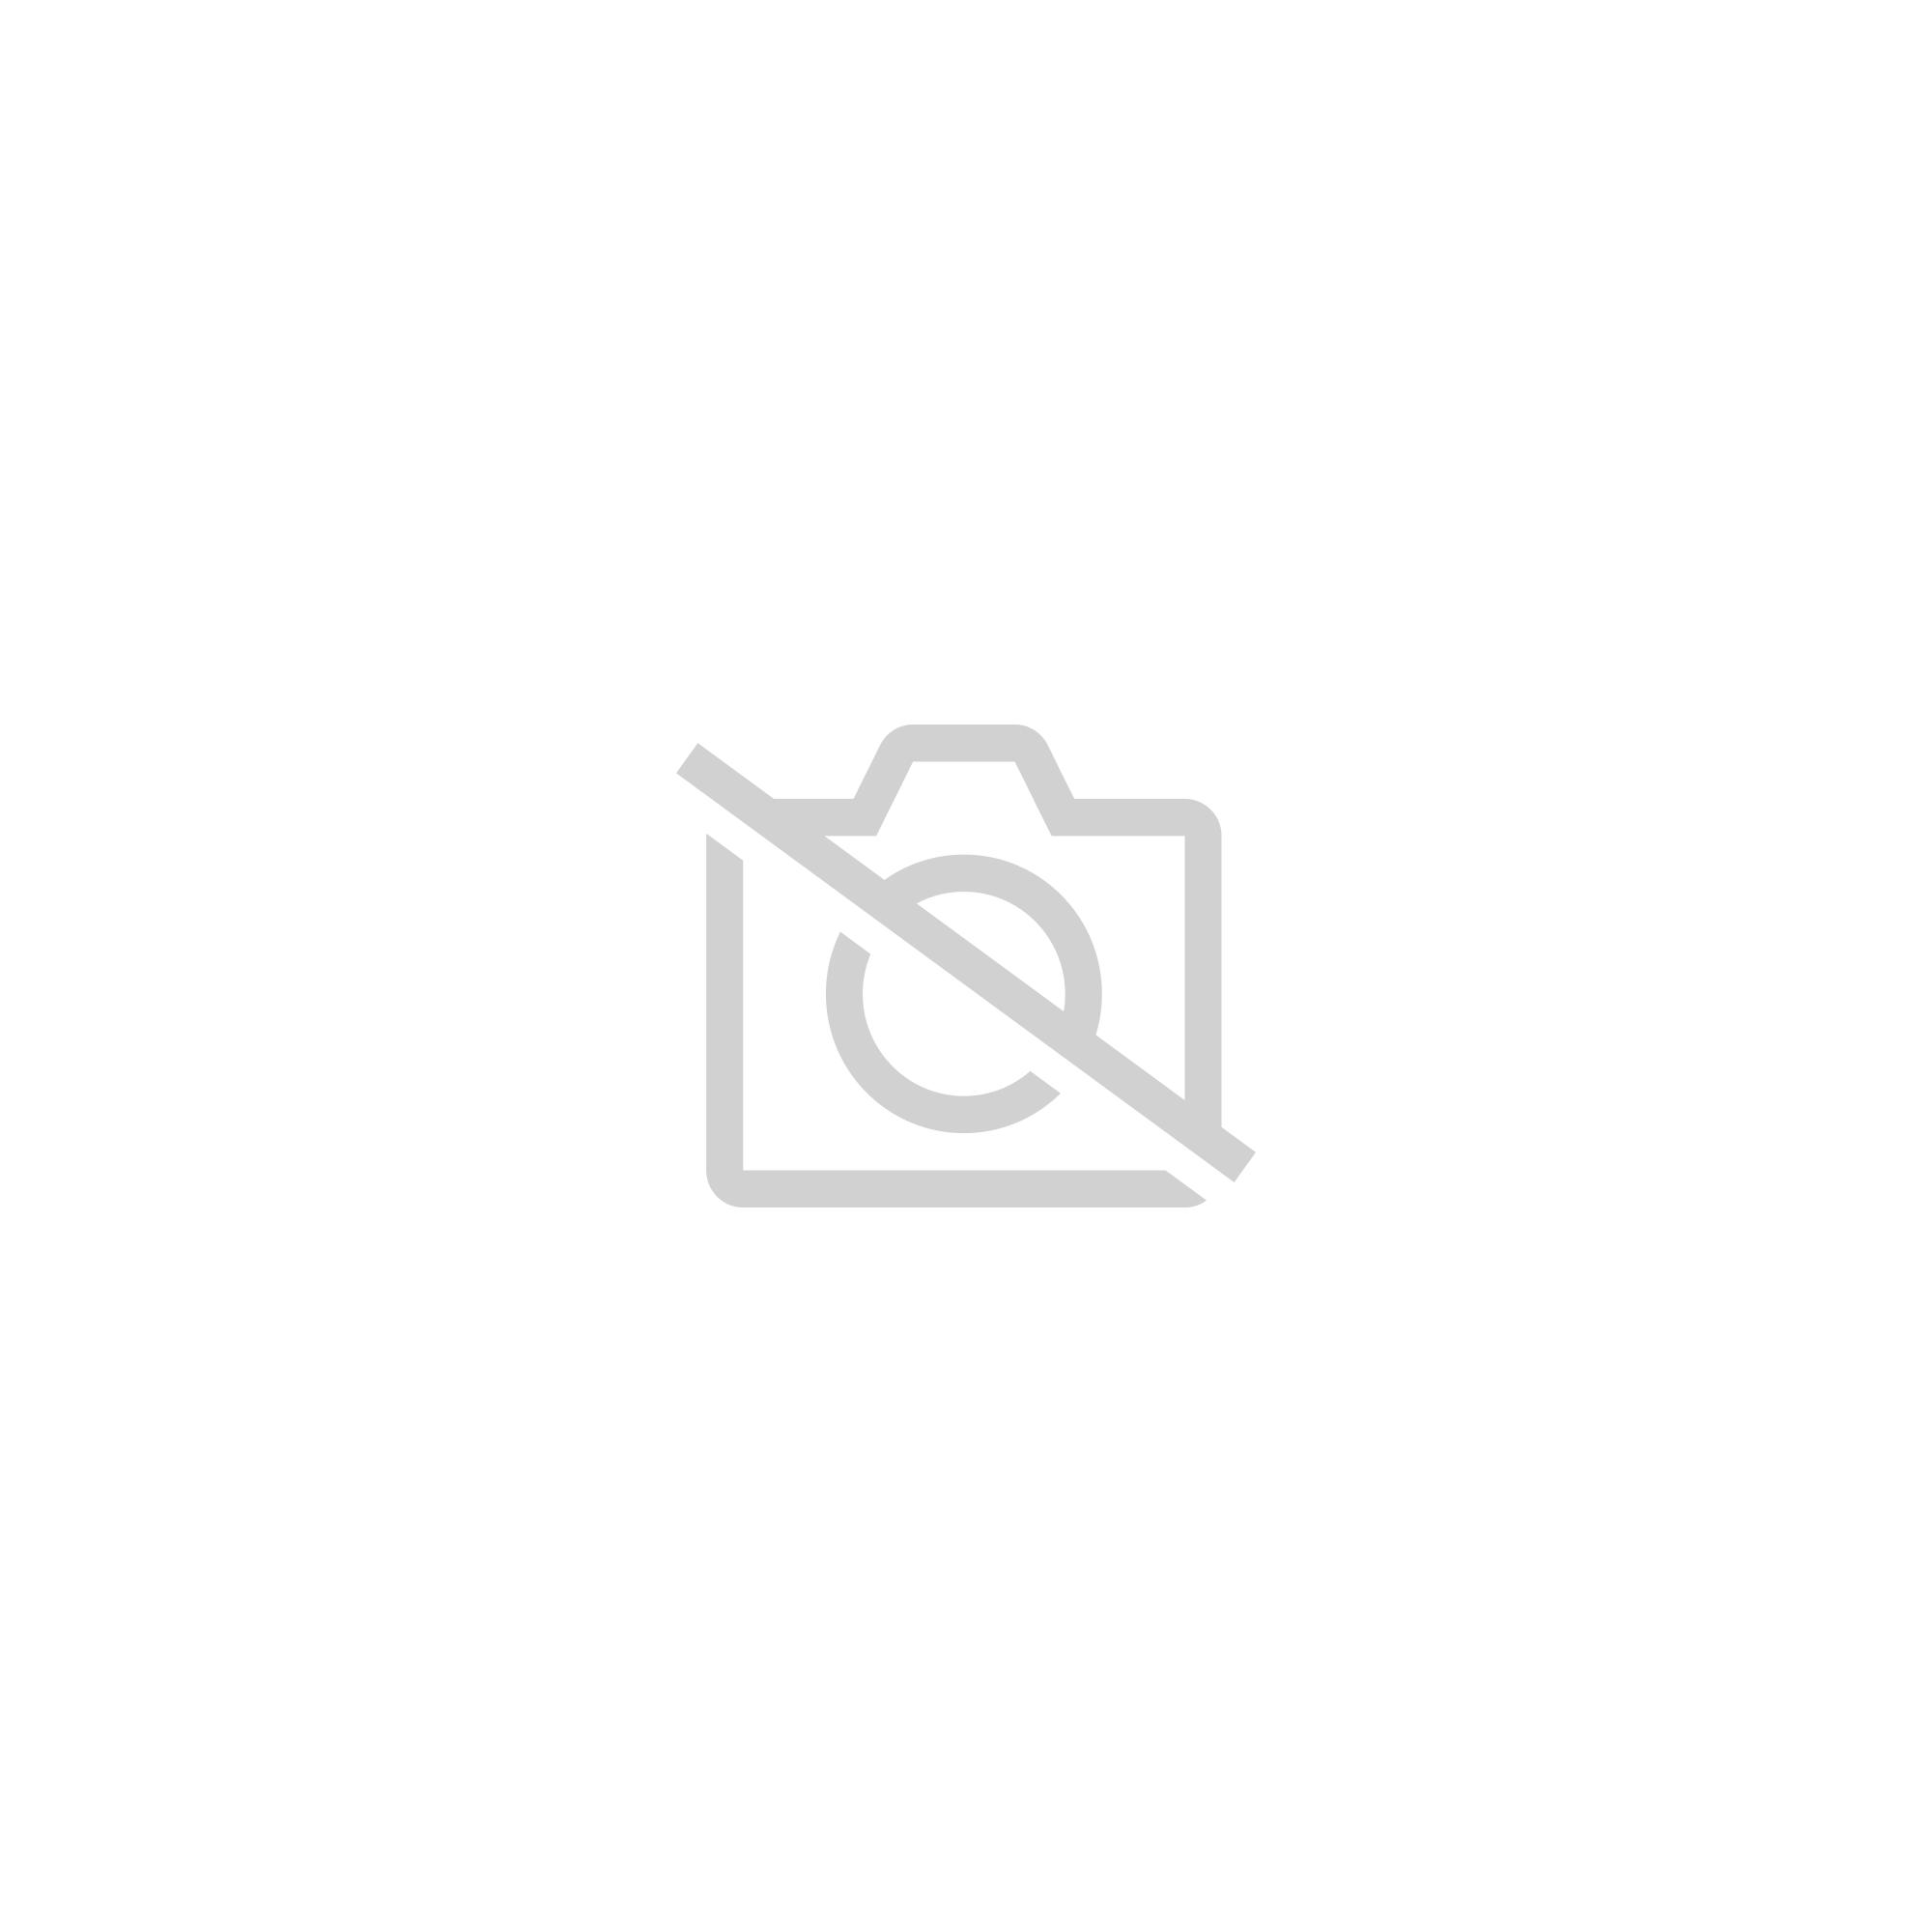 Villa-Lobos 12 Etudes Guitare